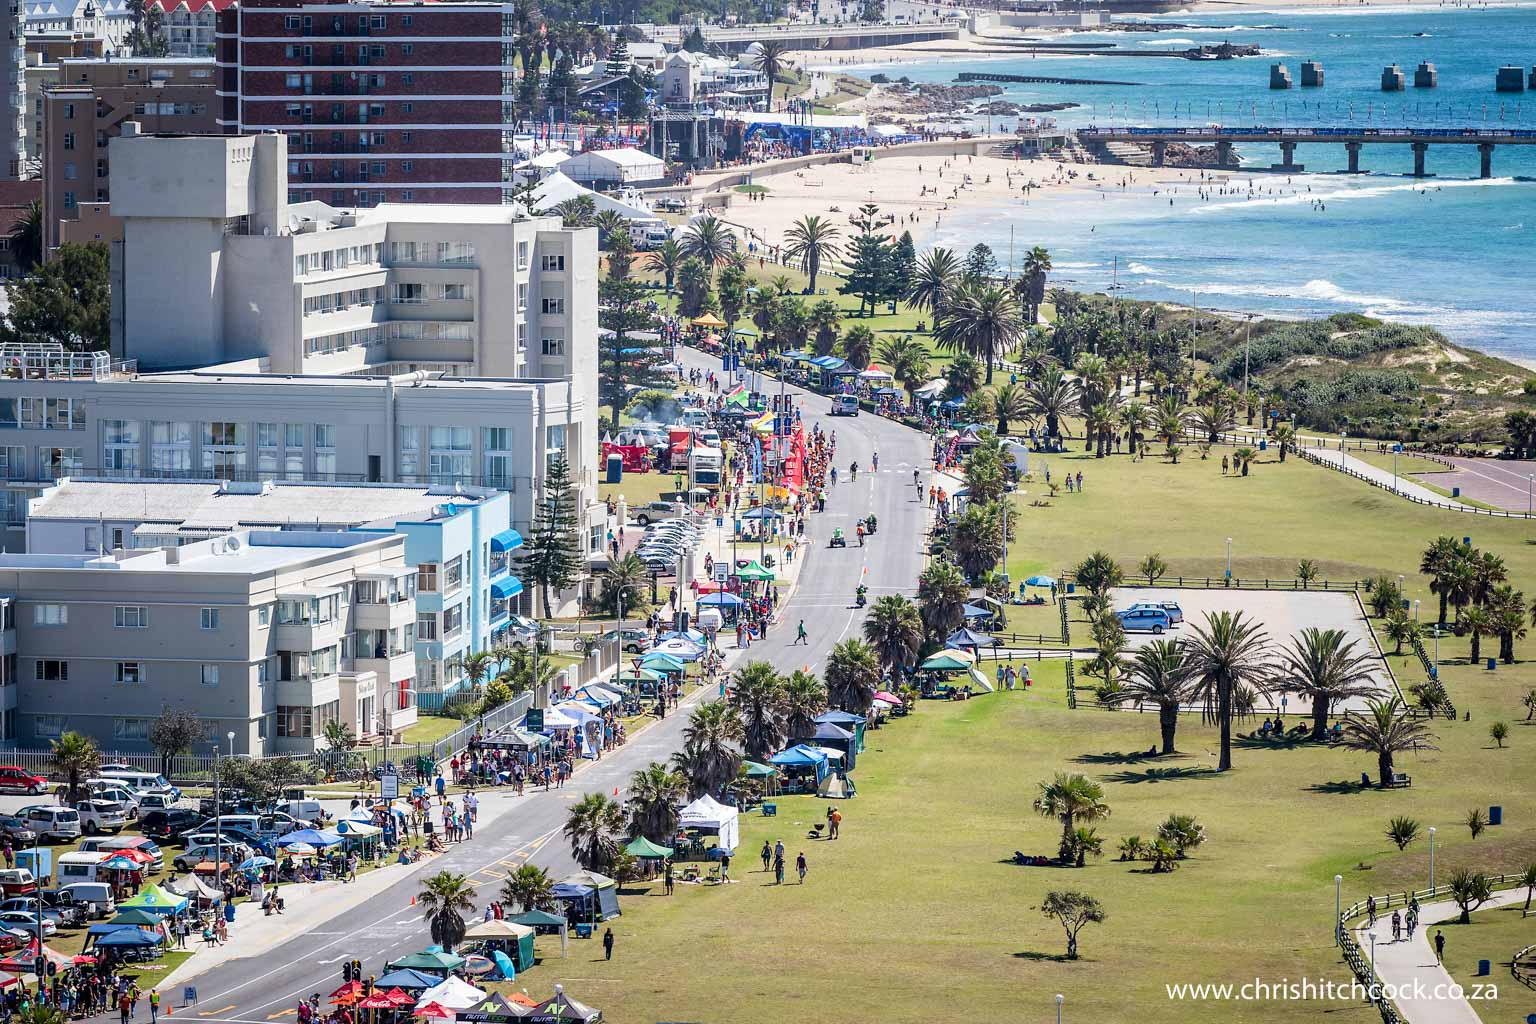 Standard bank ironman african championship chris - Population of port elizabeth south africa ...